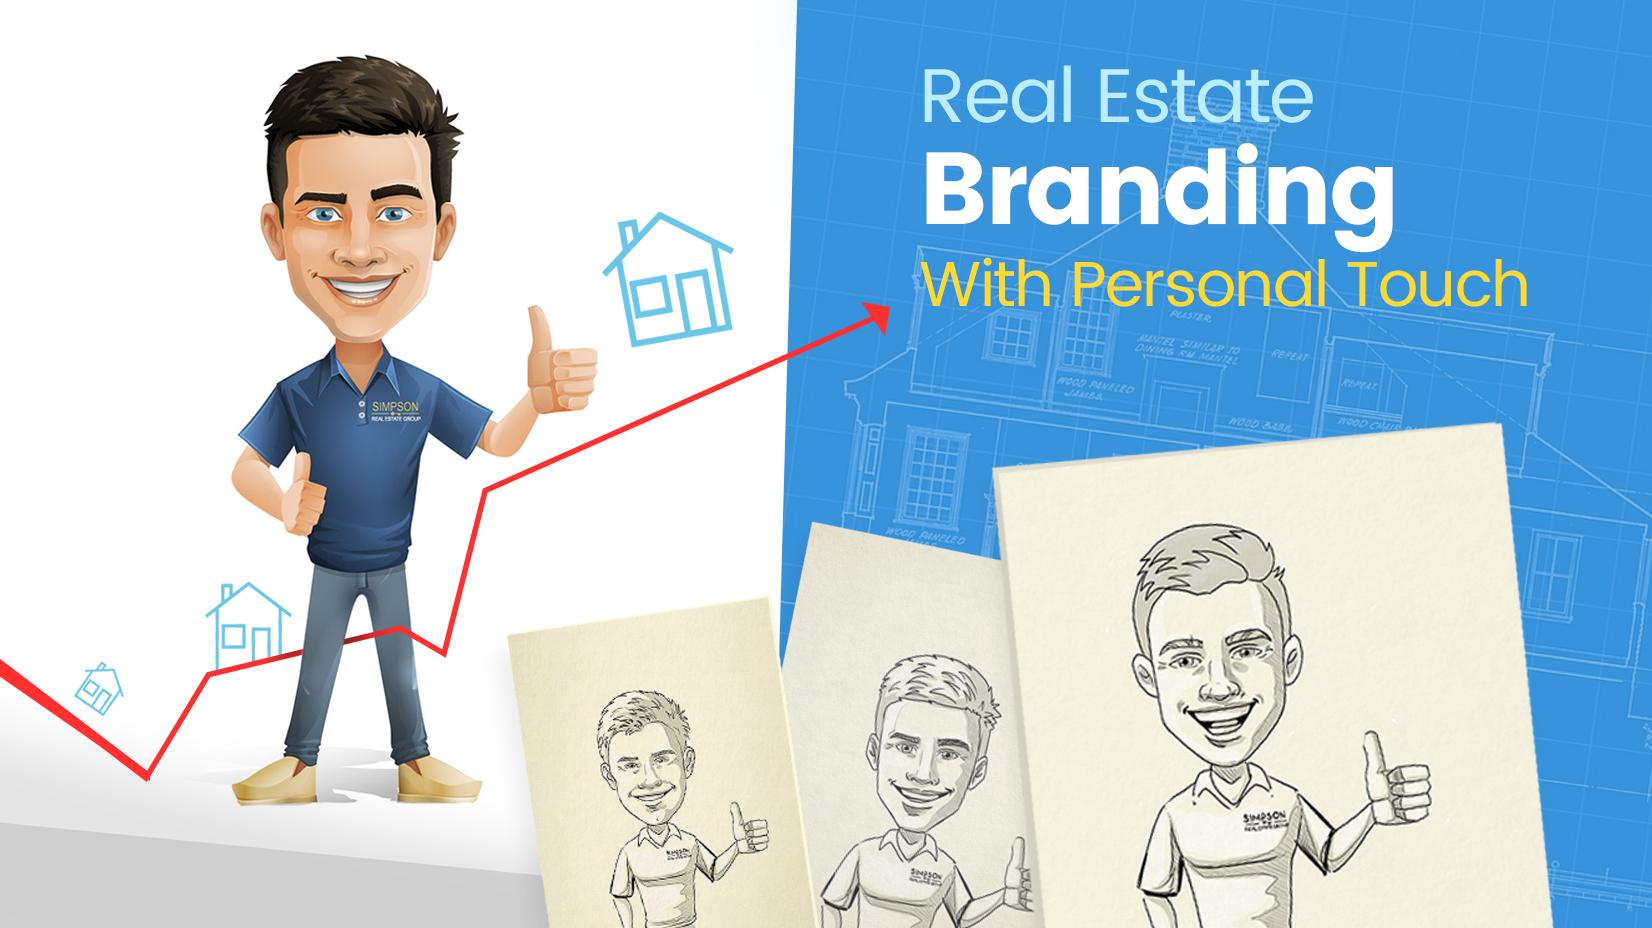 GraphicMama Case Study: Branding